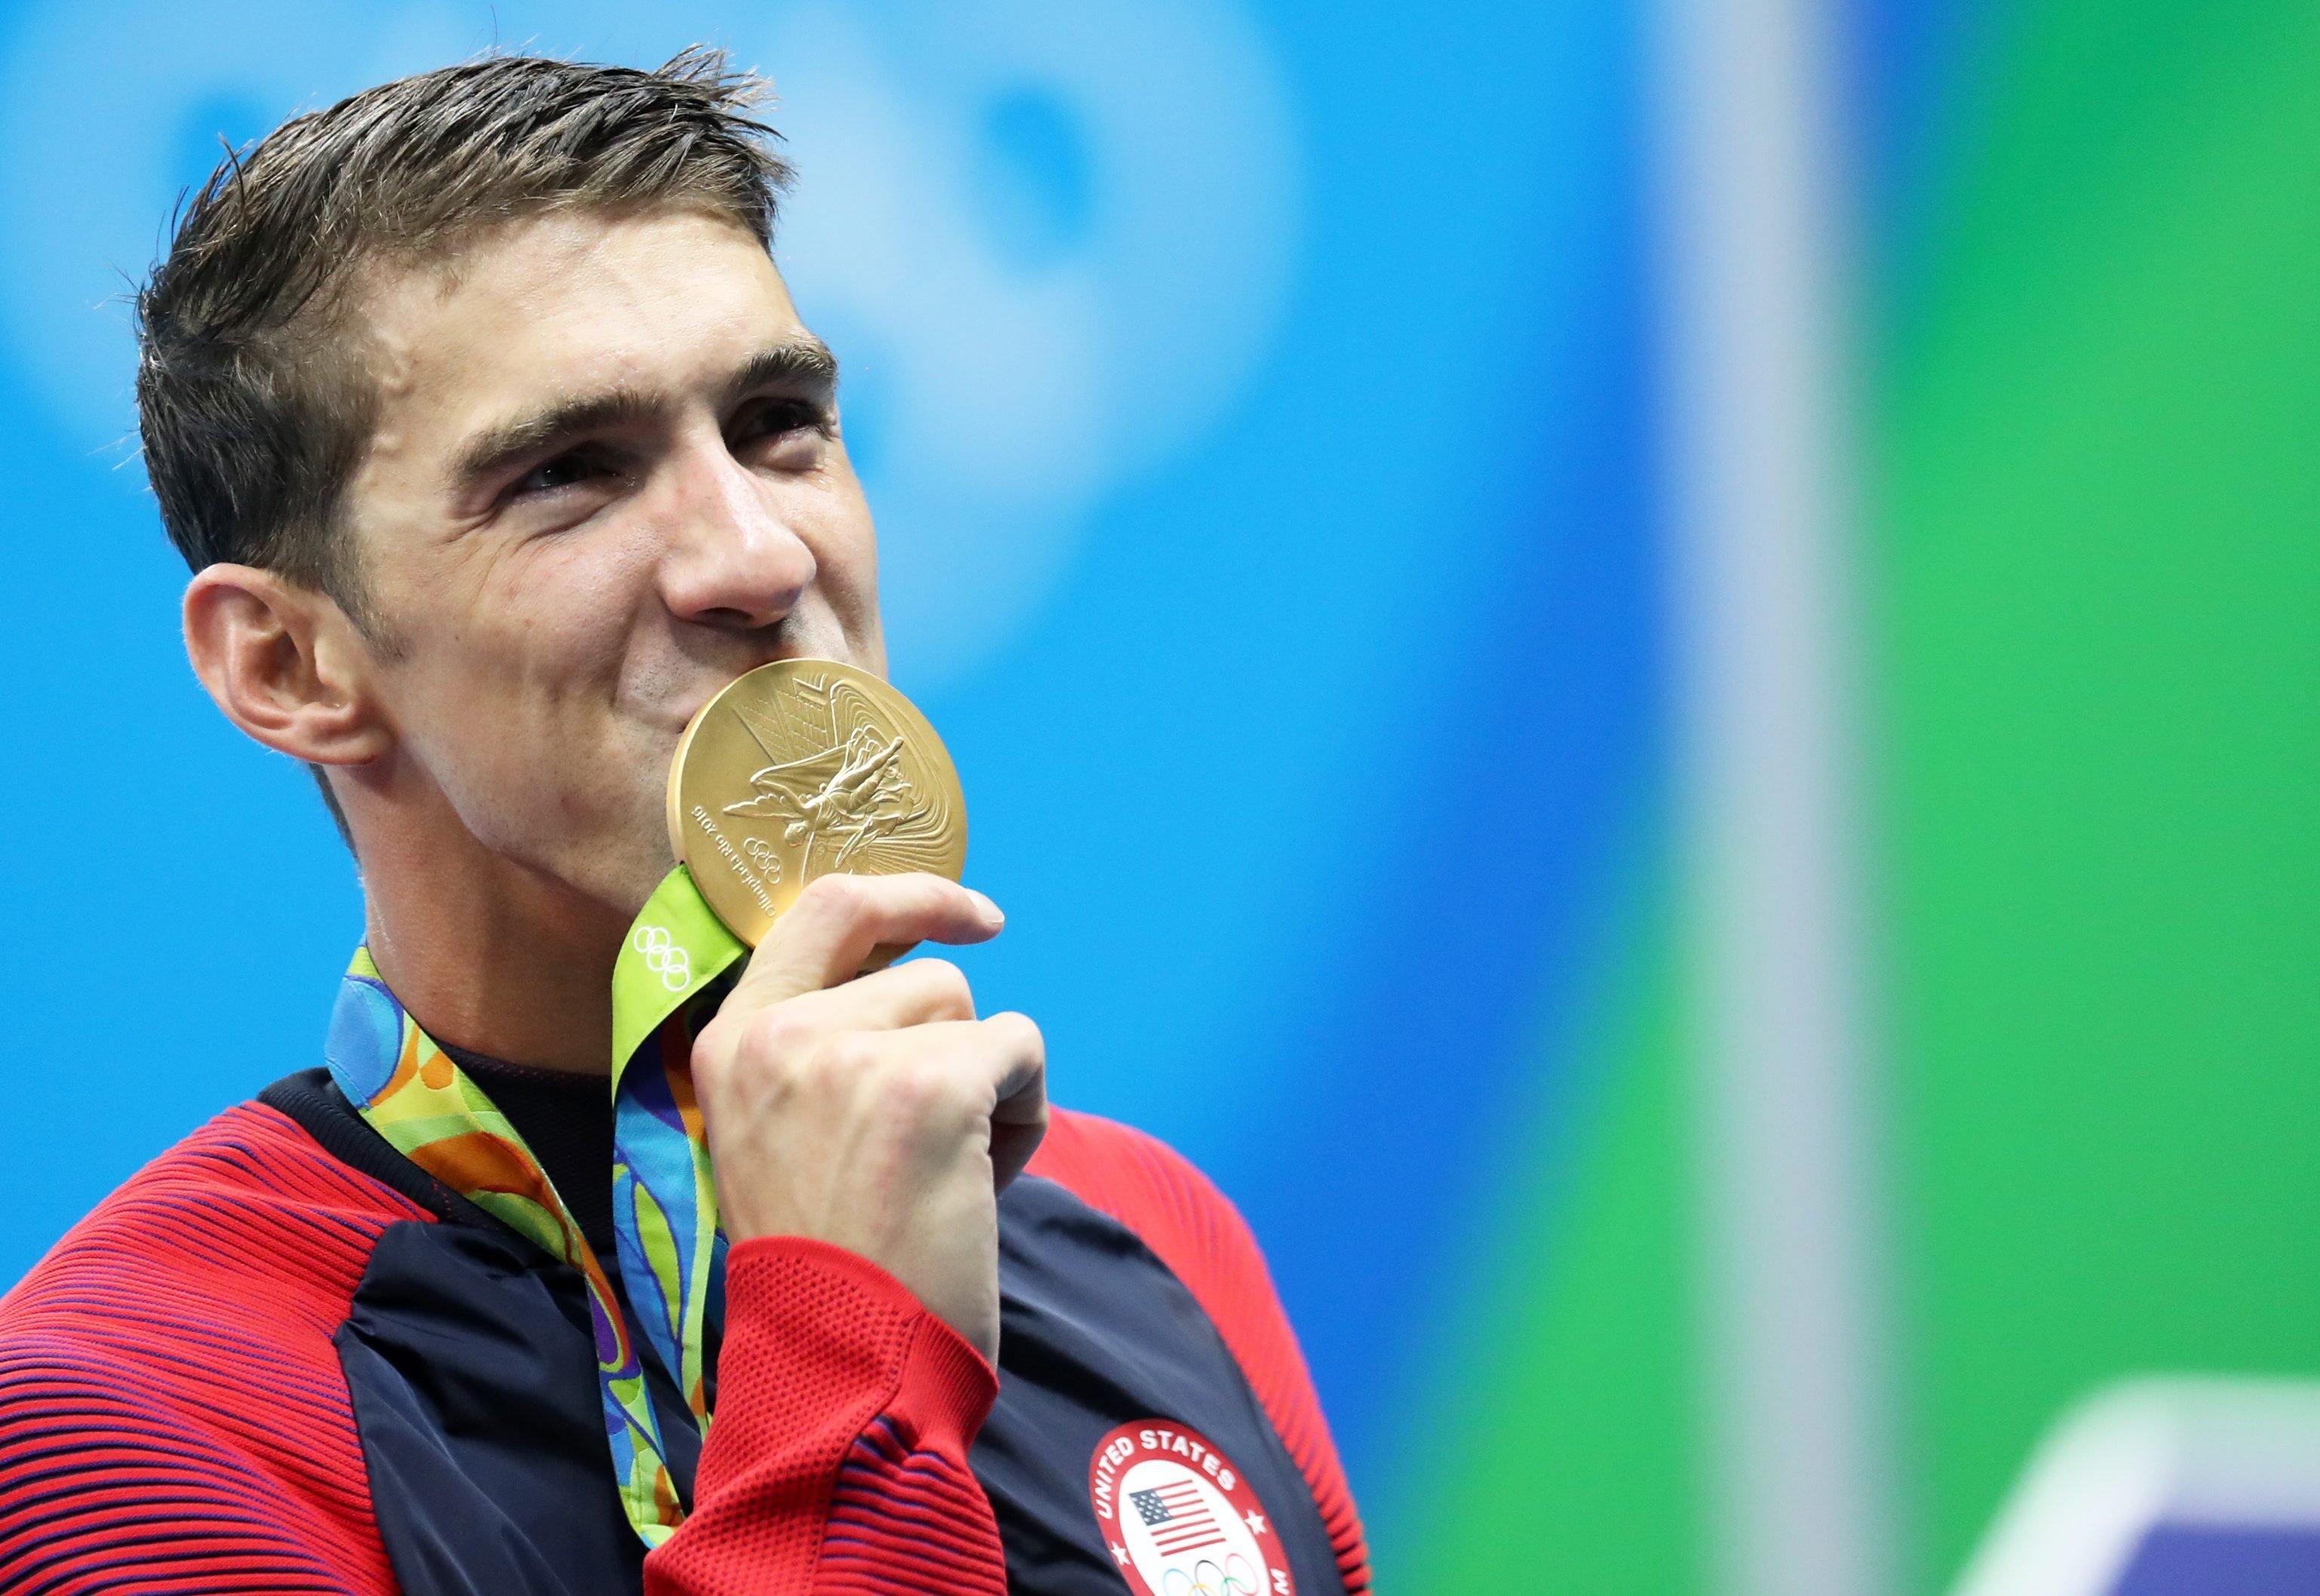 Michael phelps olympics photos 2016 Rio Olympics: Michael Phelps Best Pics Access Online